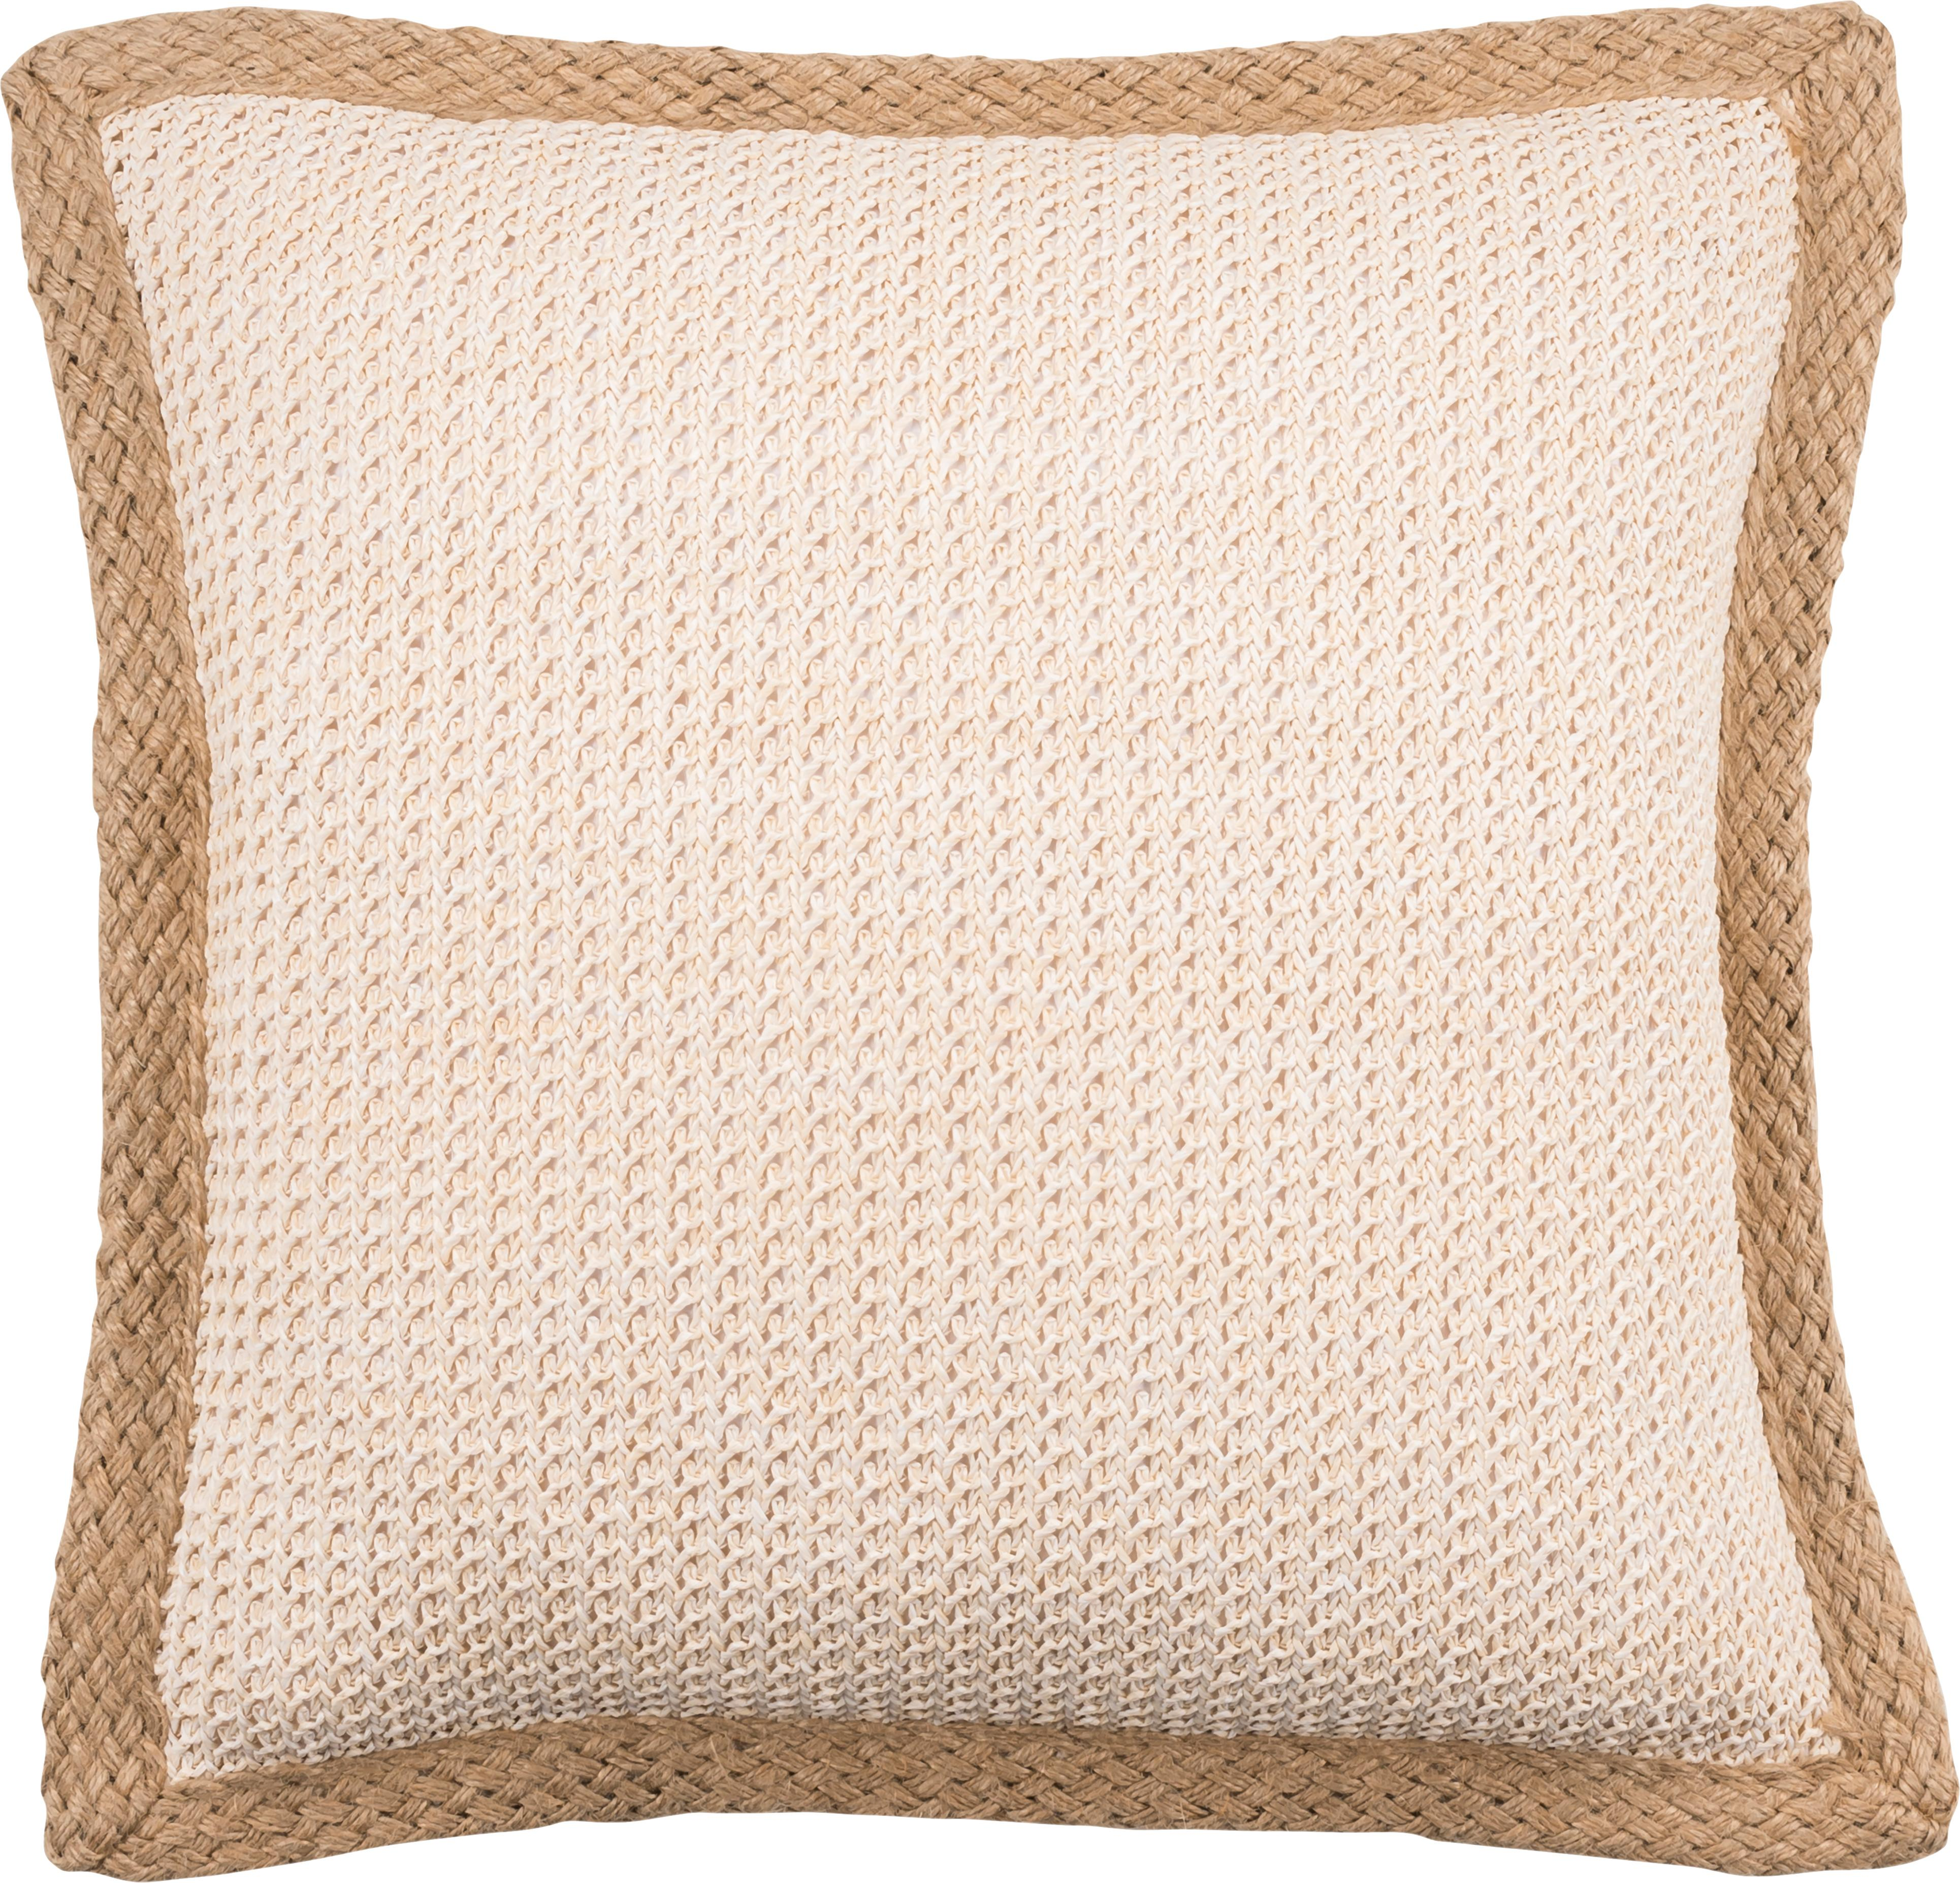 Kissenhülle Tally mit Jute-Keder, 50% Jute, 50% Baumwolle, Weiss, Beige, 45 x 45 cm